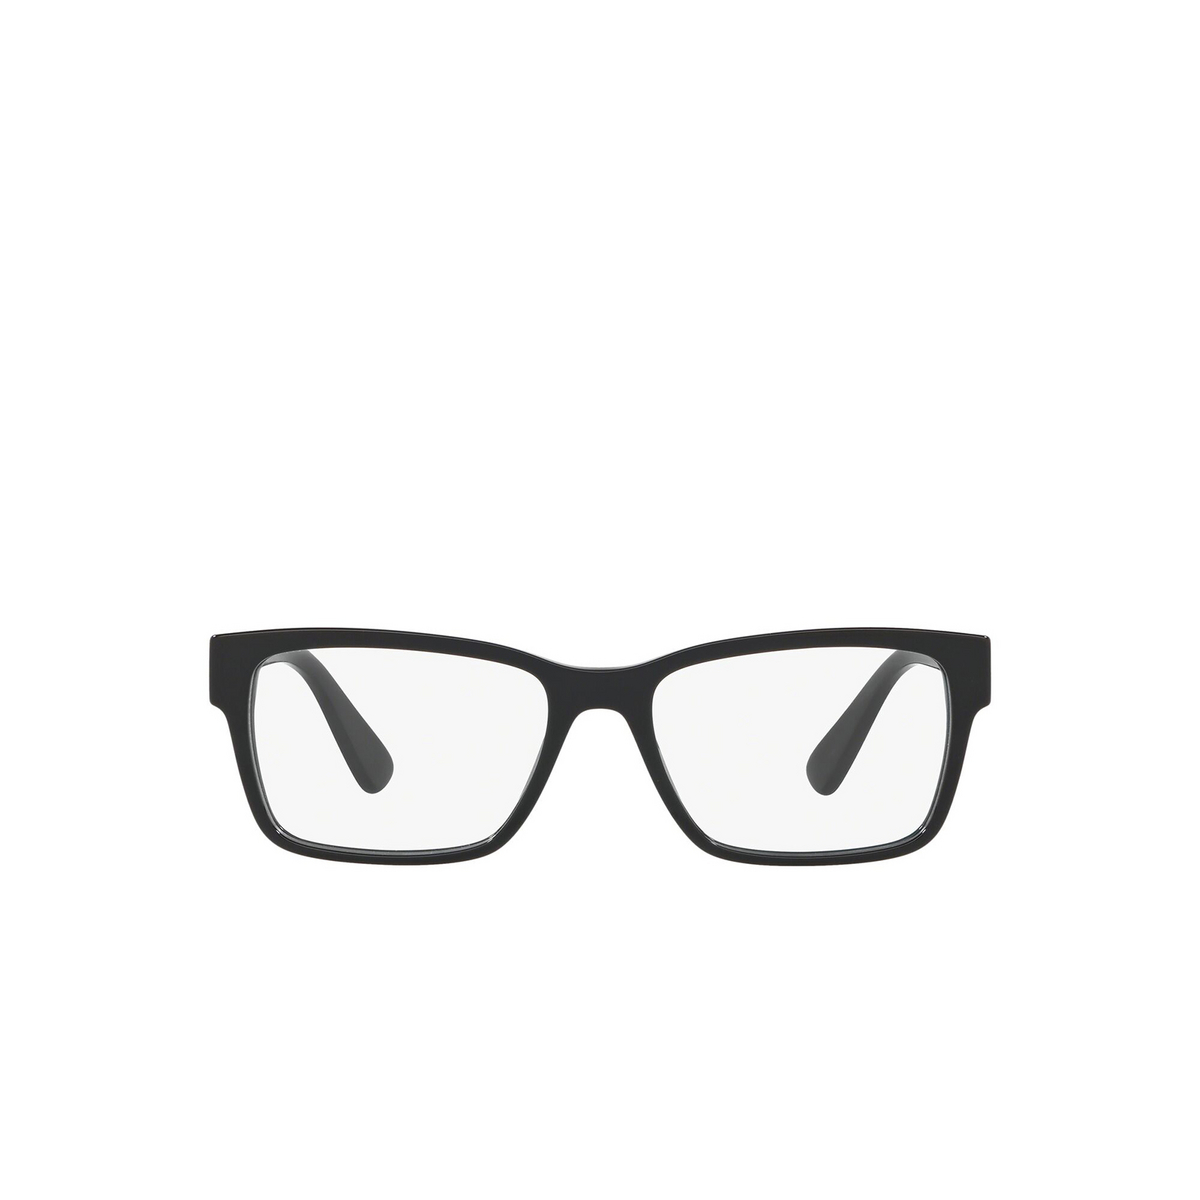 Prada® Rectangle Eyeglasses: Heritage PR 15VV color Black 1AB1O1 - front view.